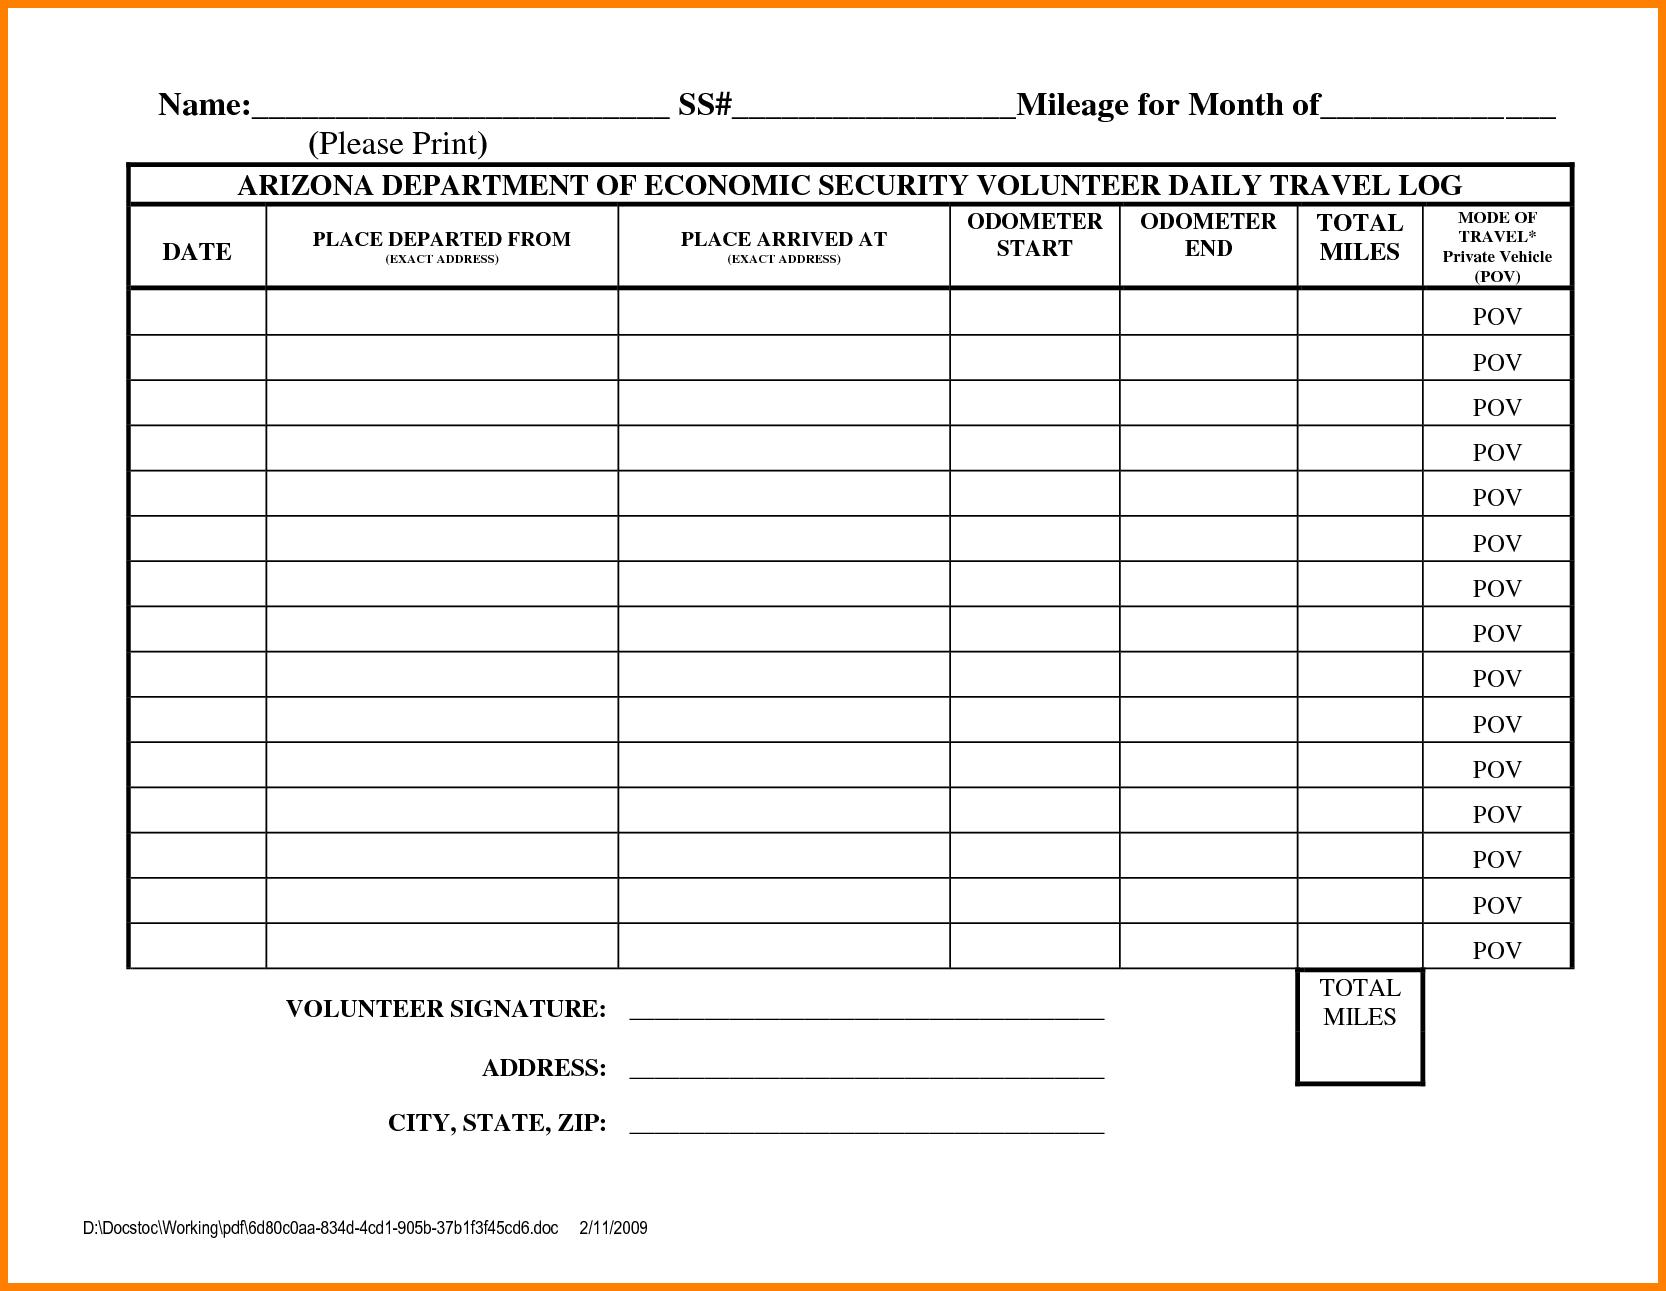 Simple Expense Reimbursement Form 1